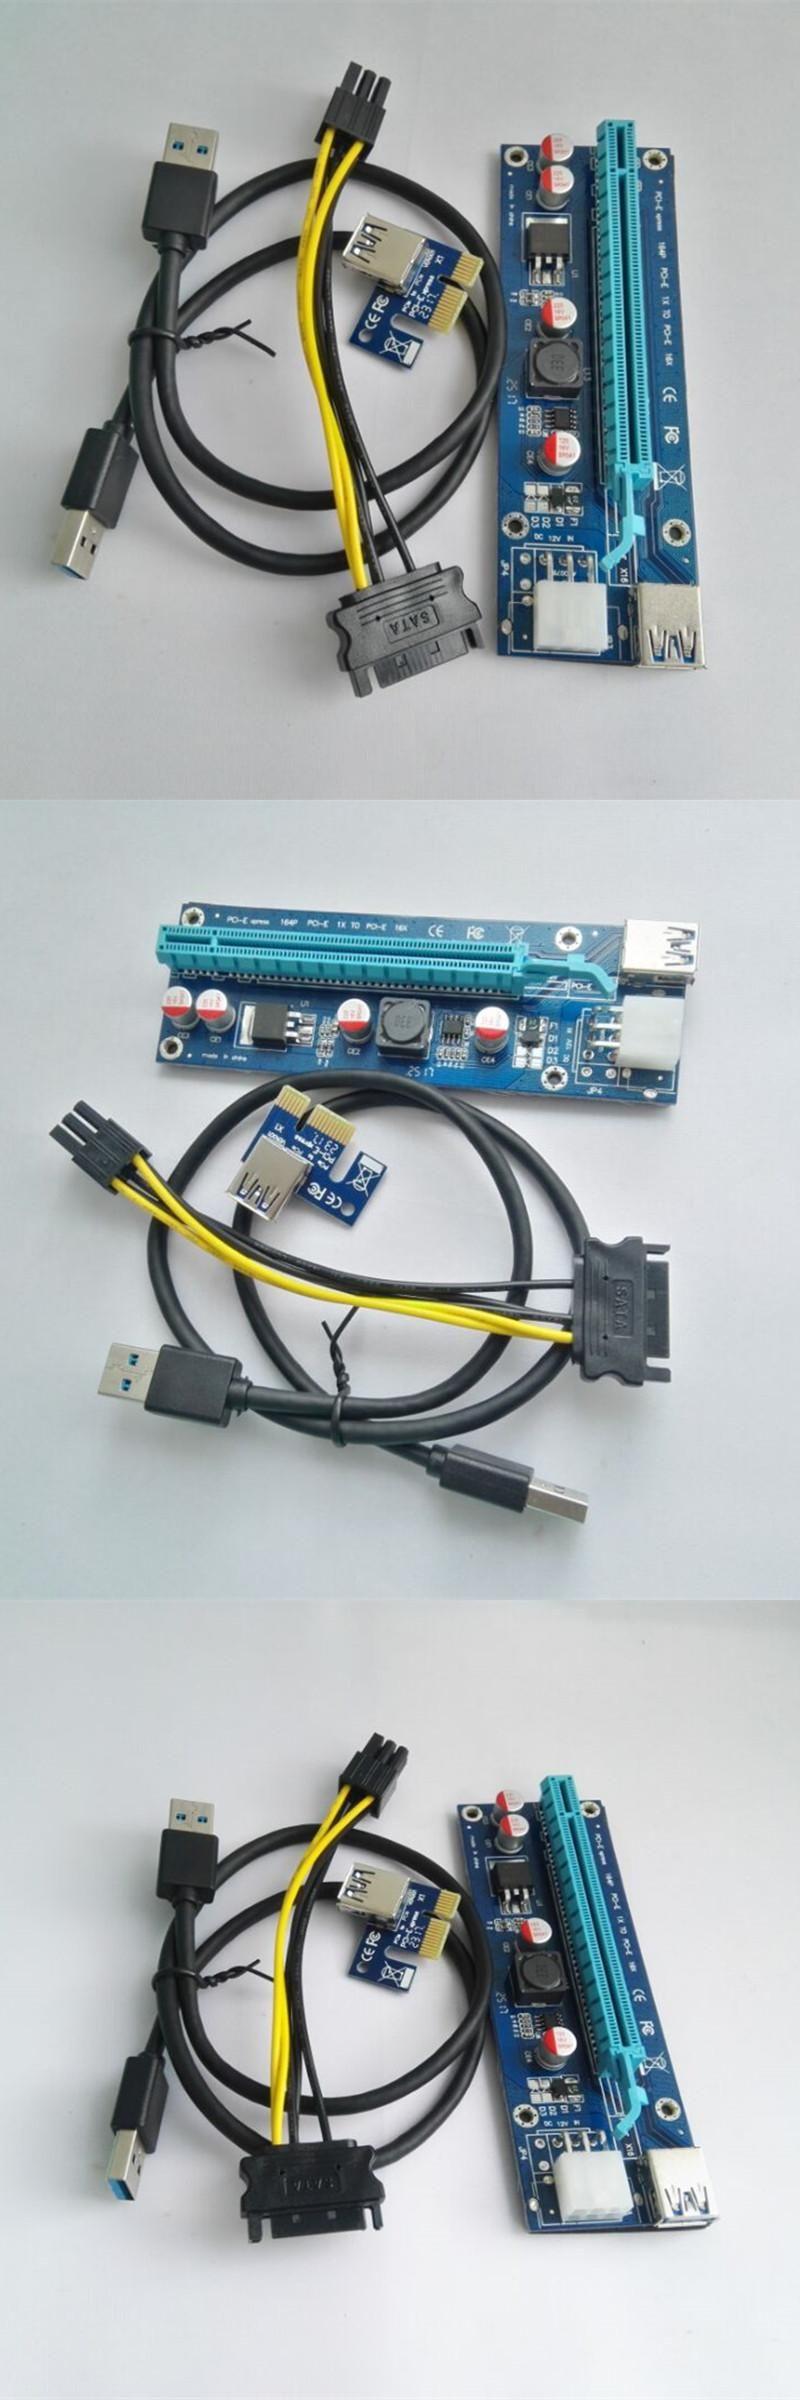 Visit to Buy] Premium quality 60cm PCI-e express 1x to 16x Extender ...